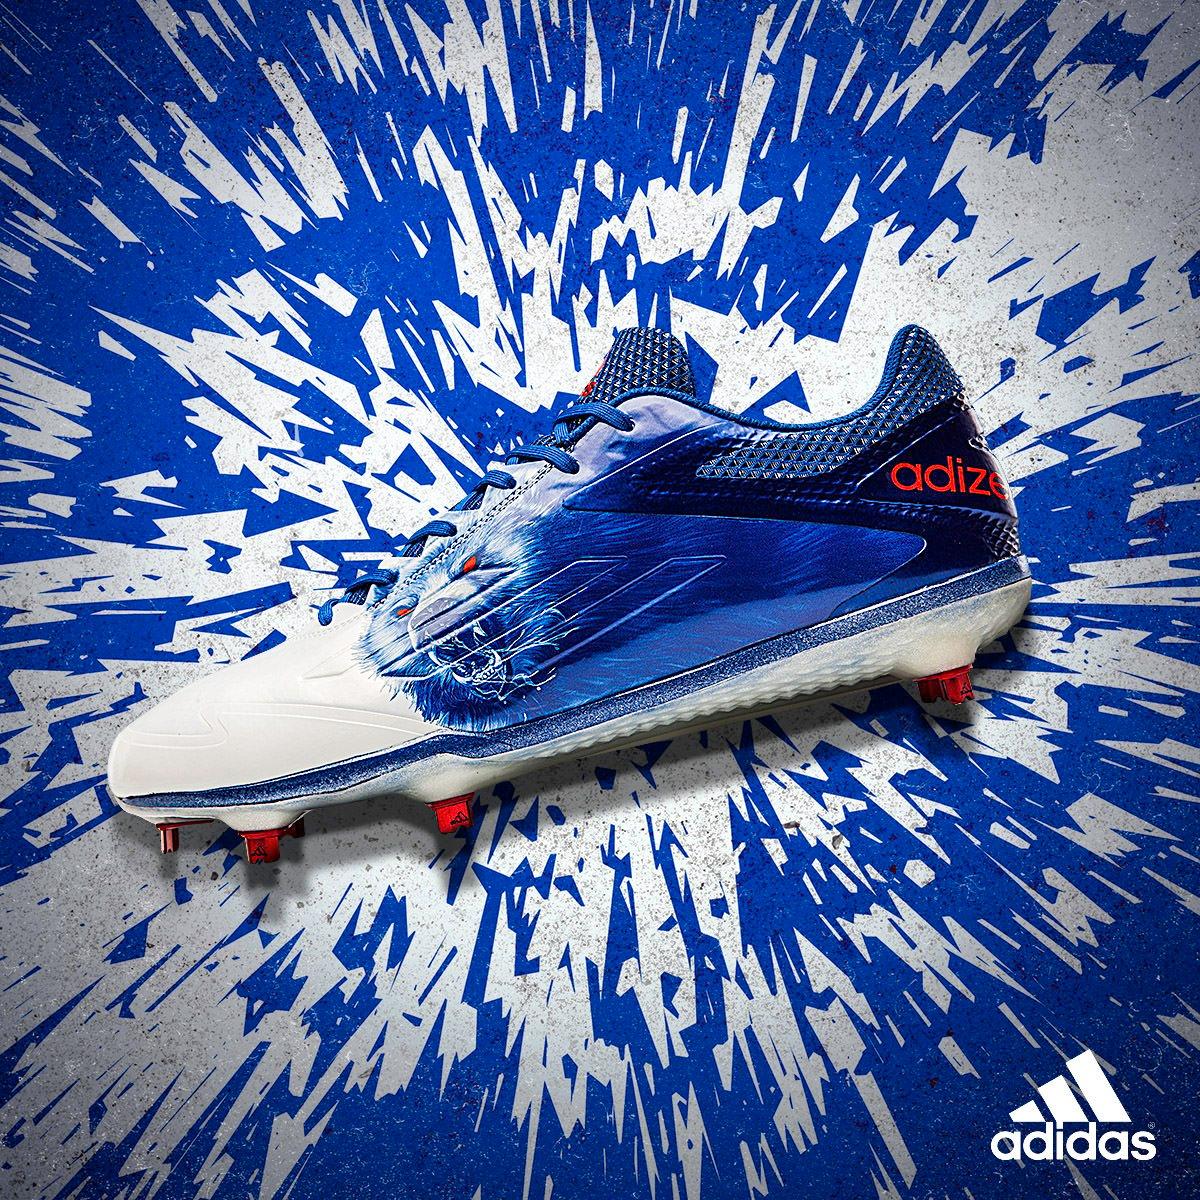 adidas_Baseball_Kris_Bryant_Uncaged_Bear_Side